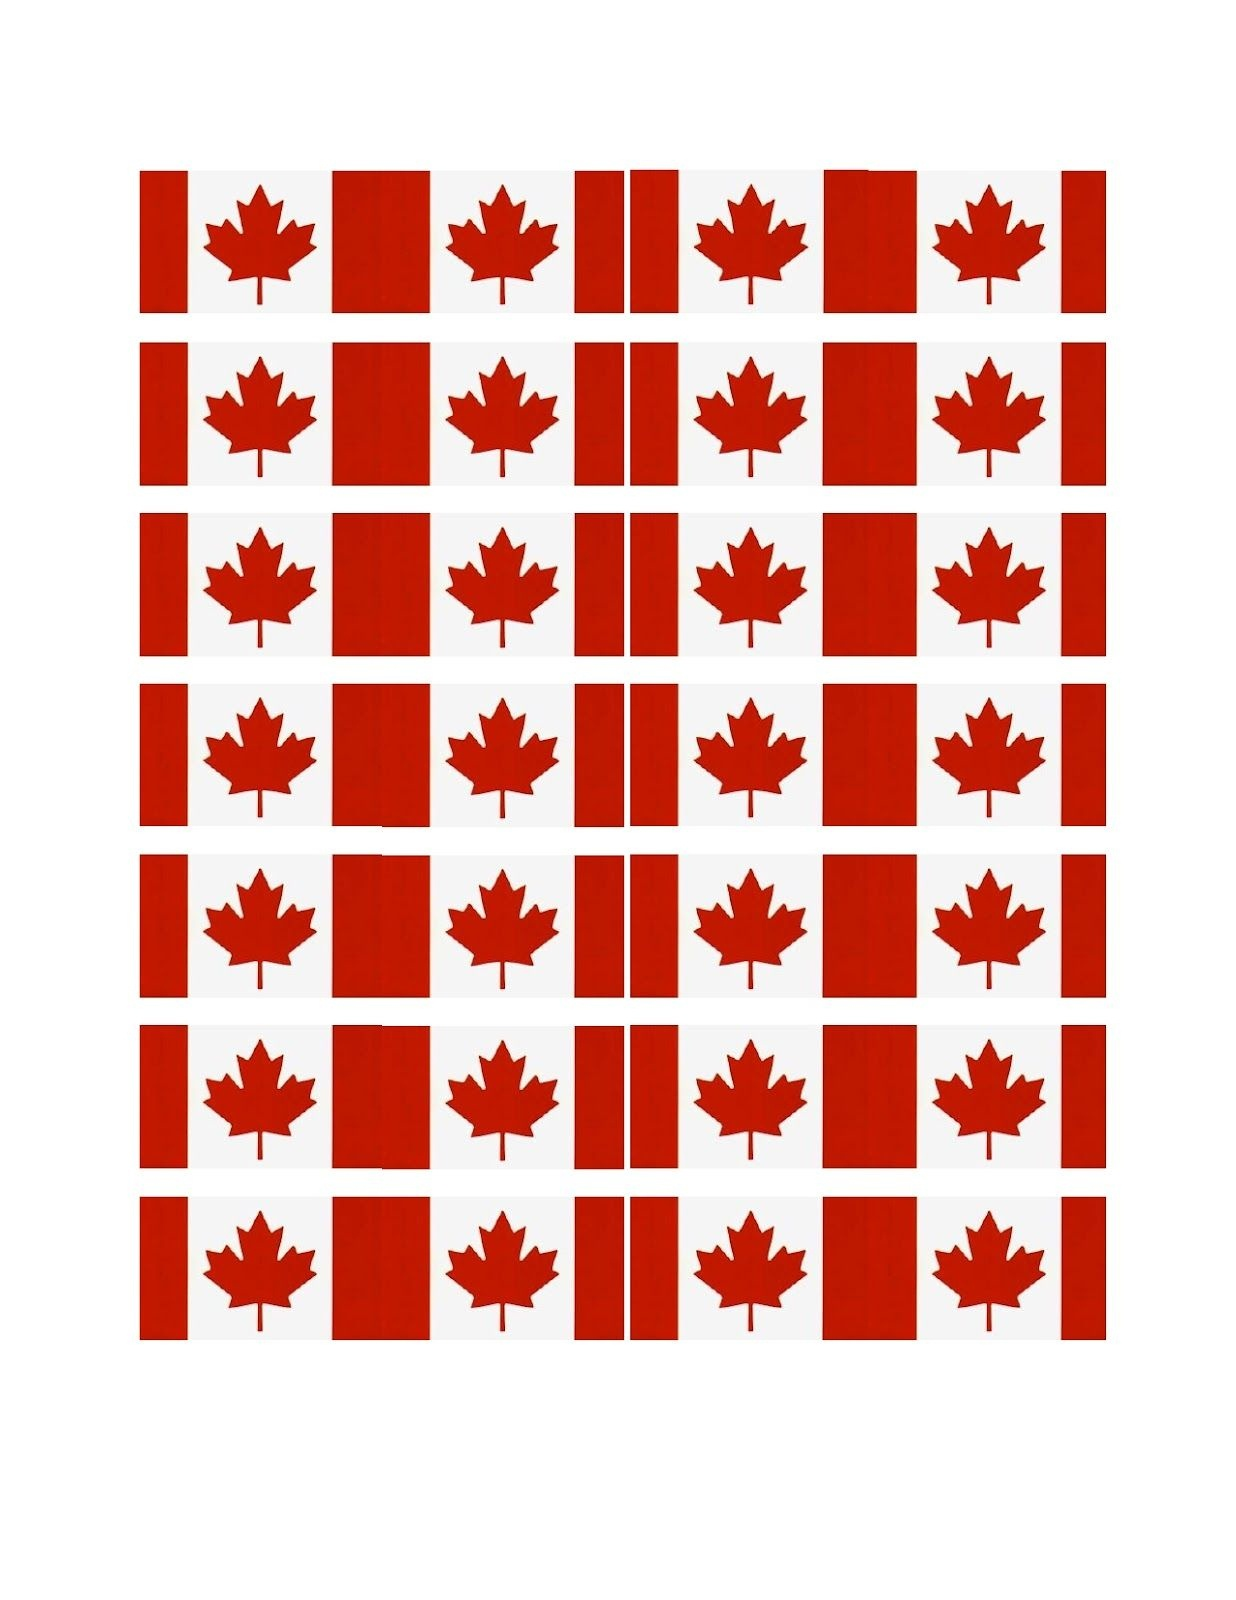 Free Printable Canada Cupcake Flags | Spring & Summer Holidays - Cupcake Flags Printable Free